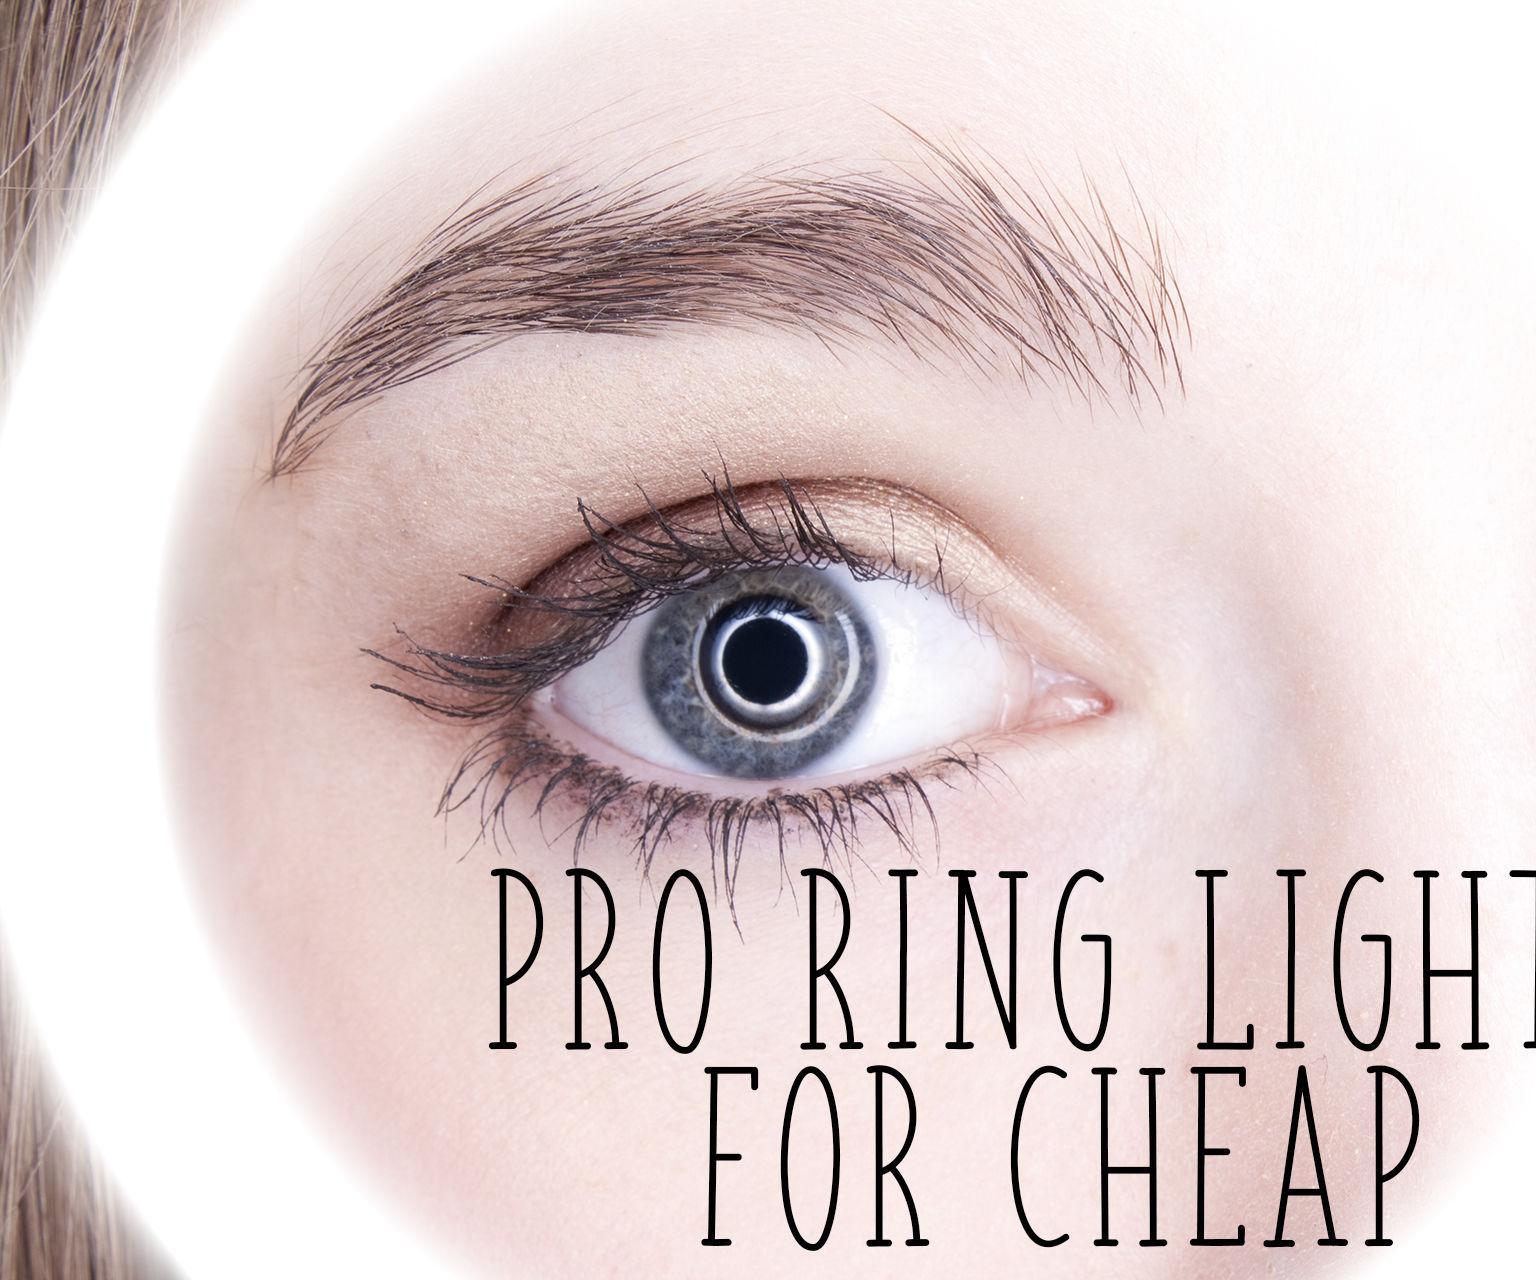 PRO RING LIGHT FOR CHEAP